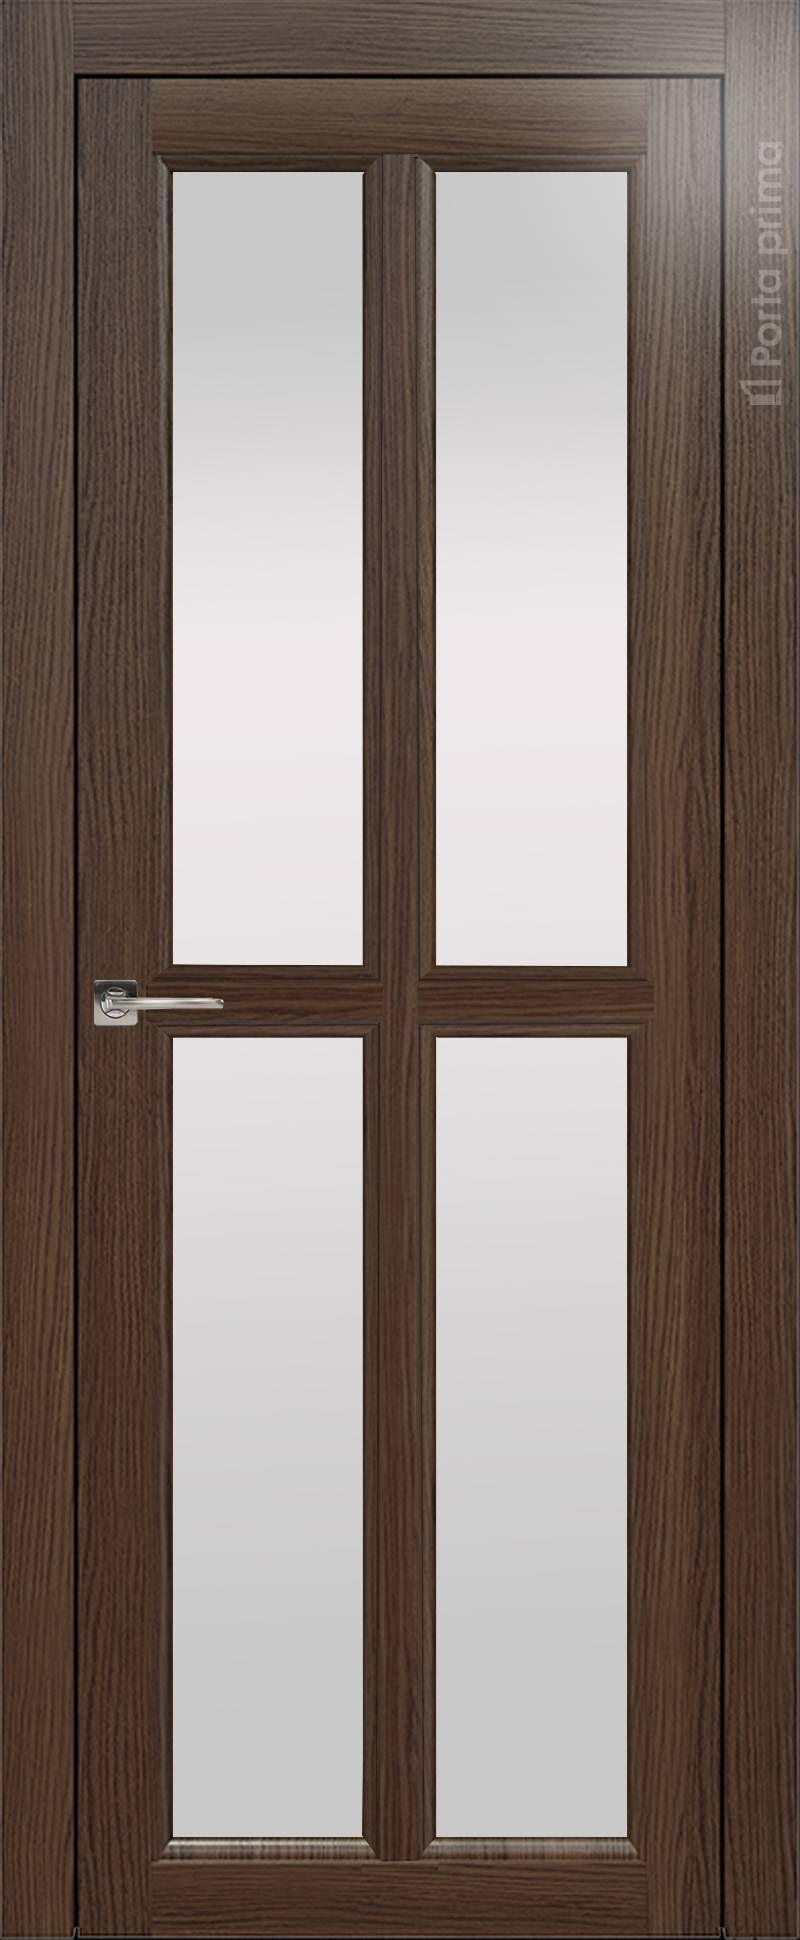 Sorrento-R И4 цвет - Дуб торонто Со стеклом (ДО)